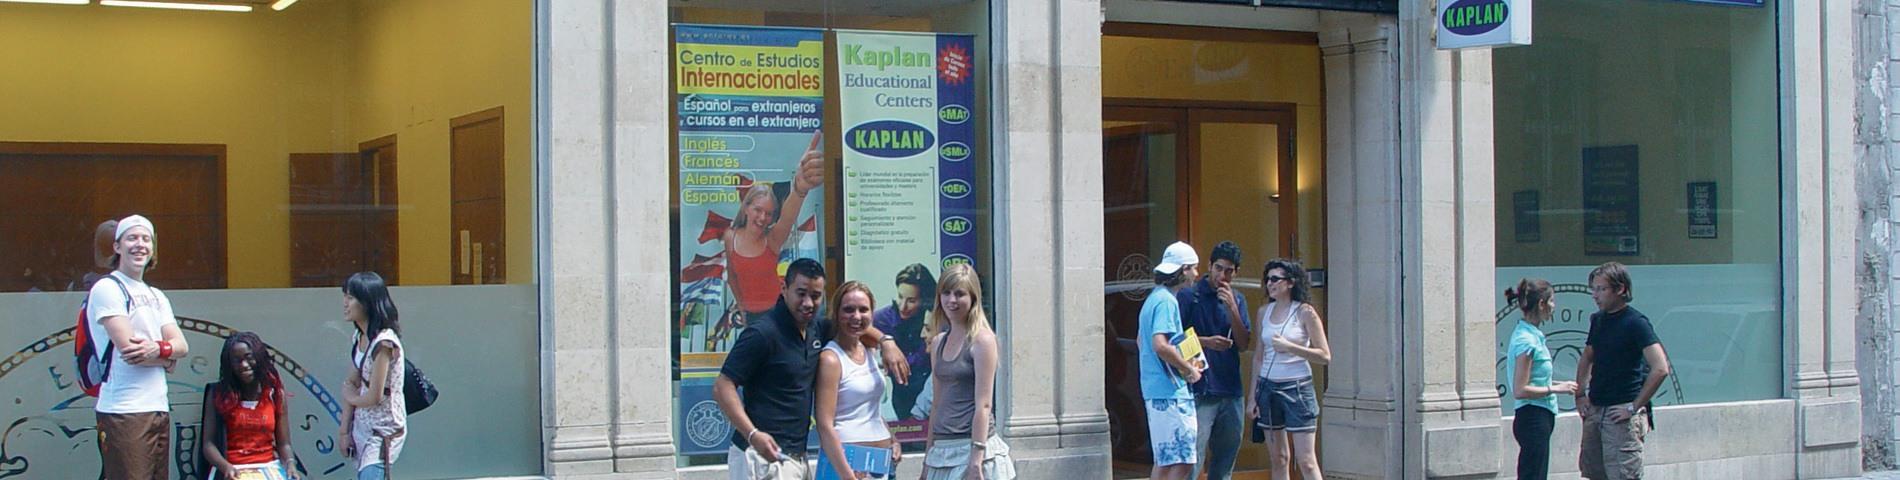 Madrid enforex spanish language school